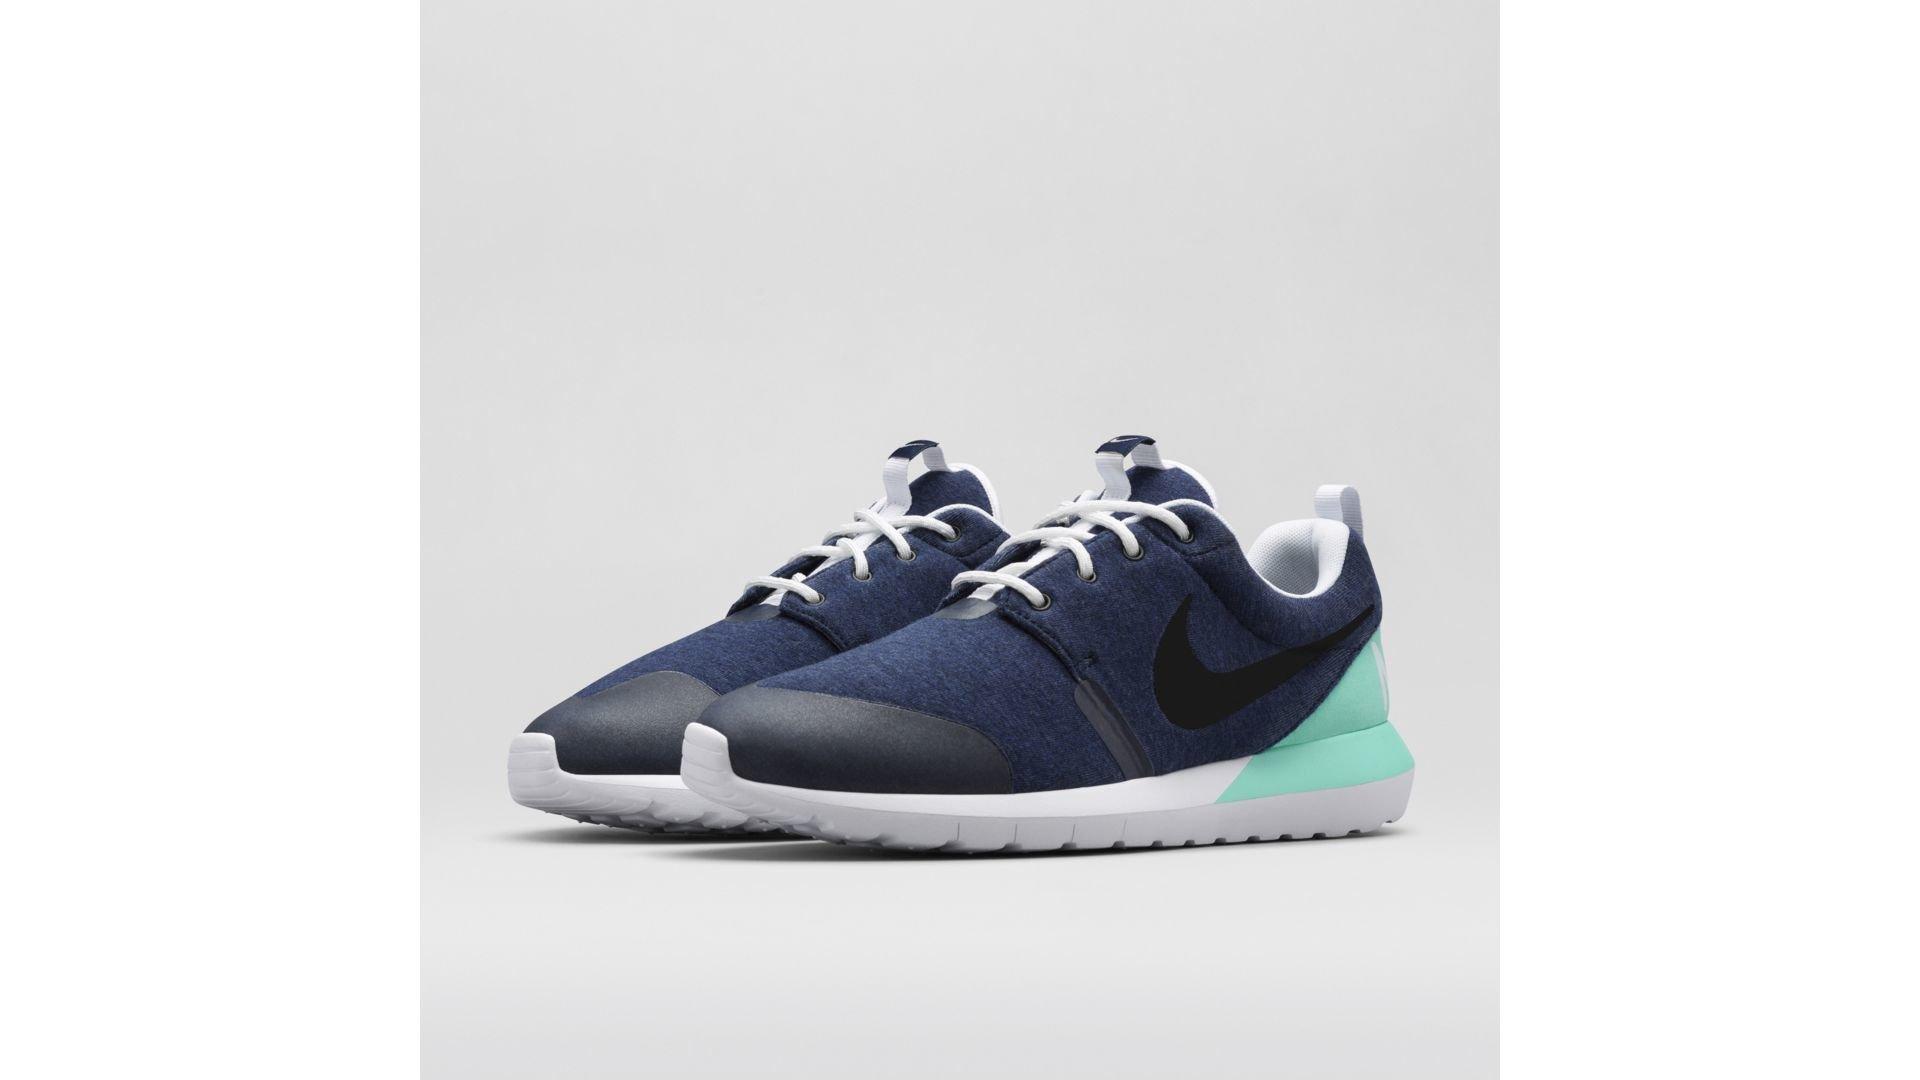 Nike Roshe Run Tech Fleece Obsidian (652804-403)